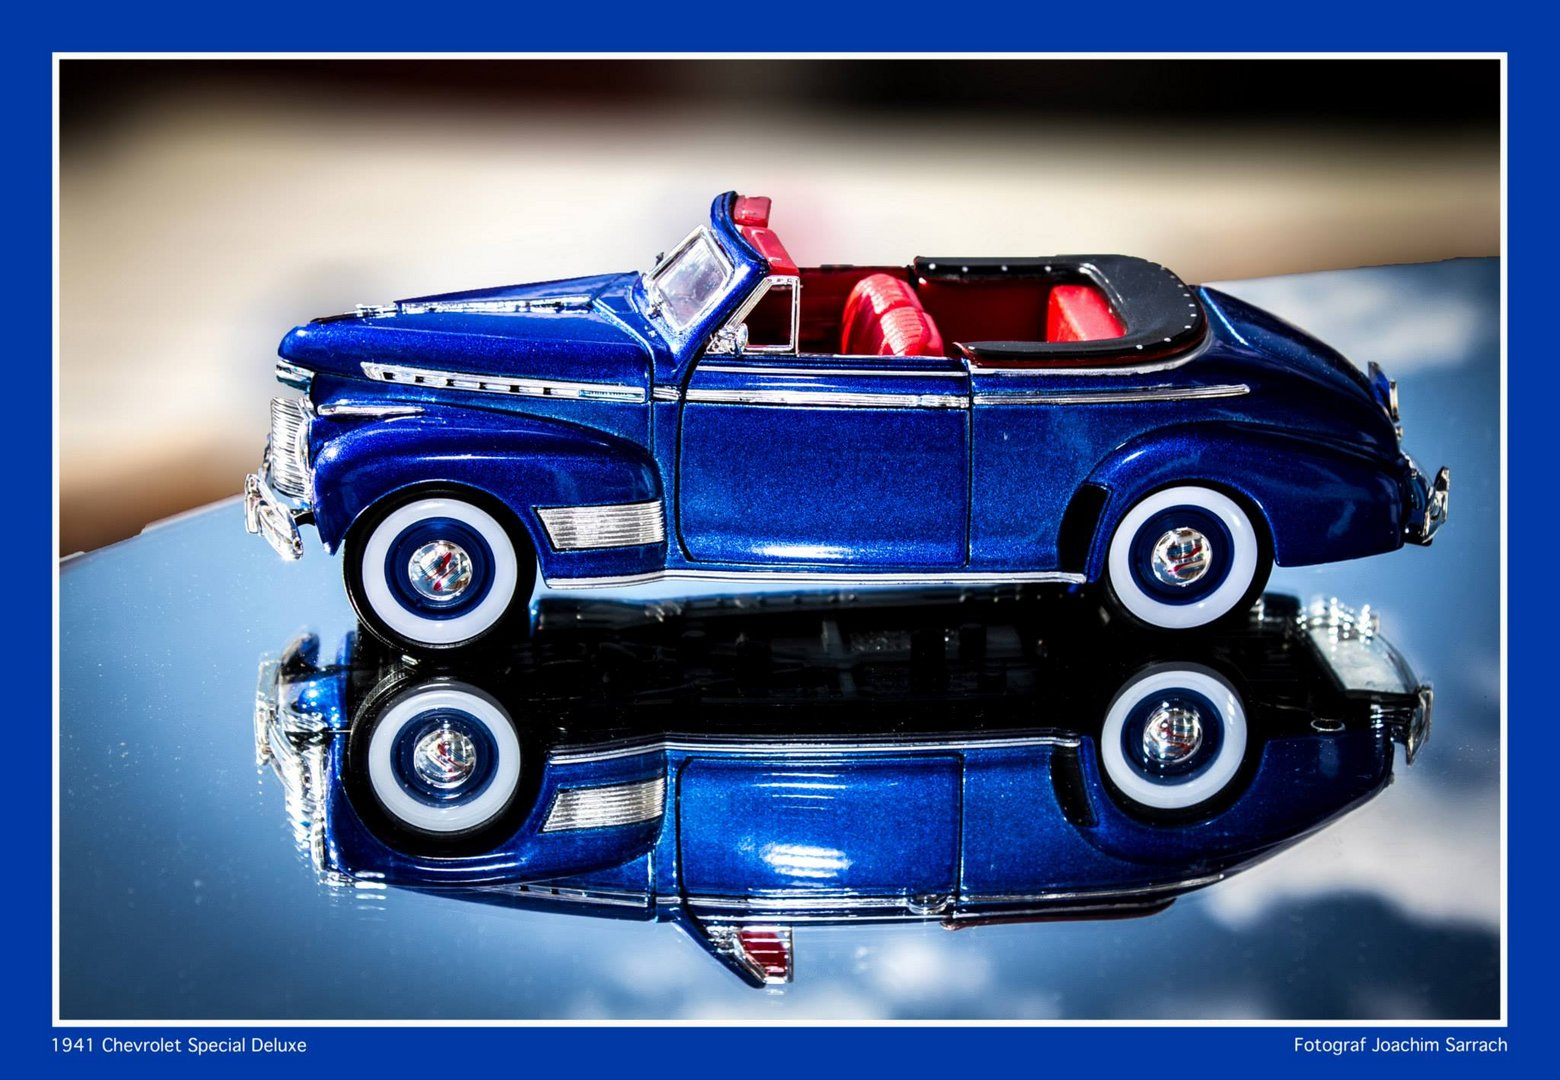 1941 Chevloret Special Deluxe